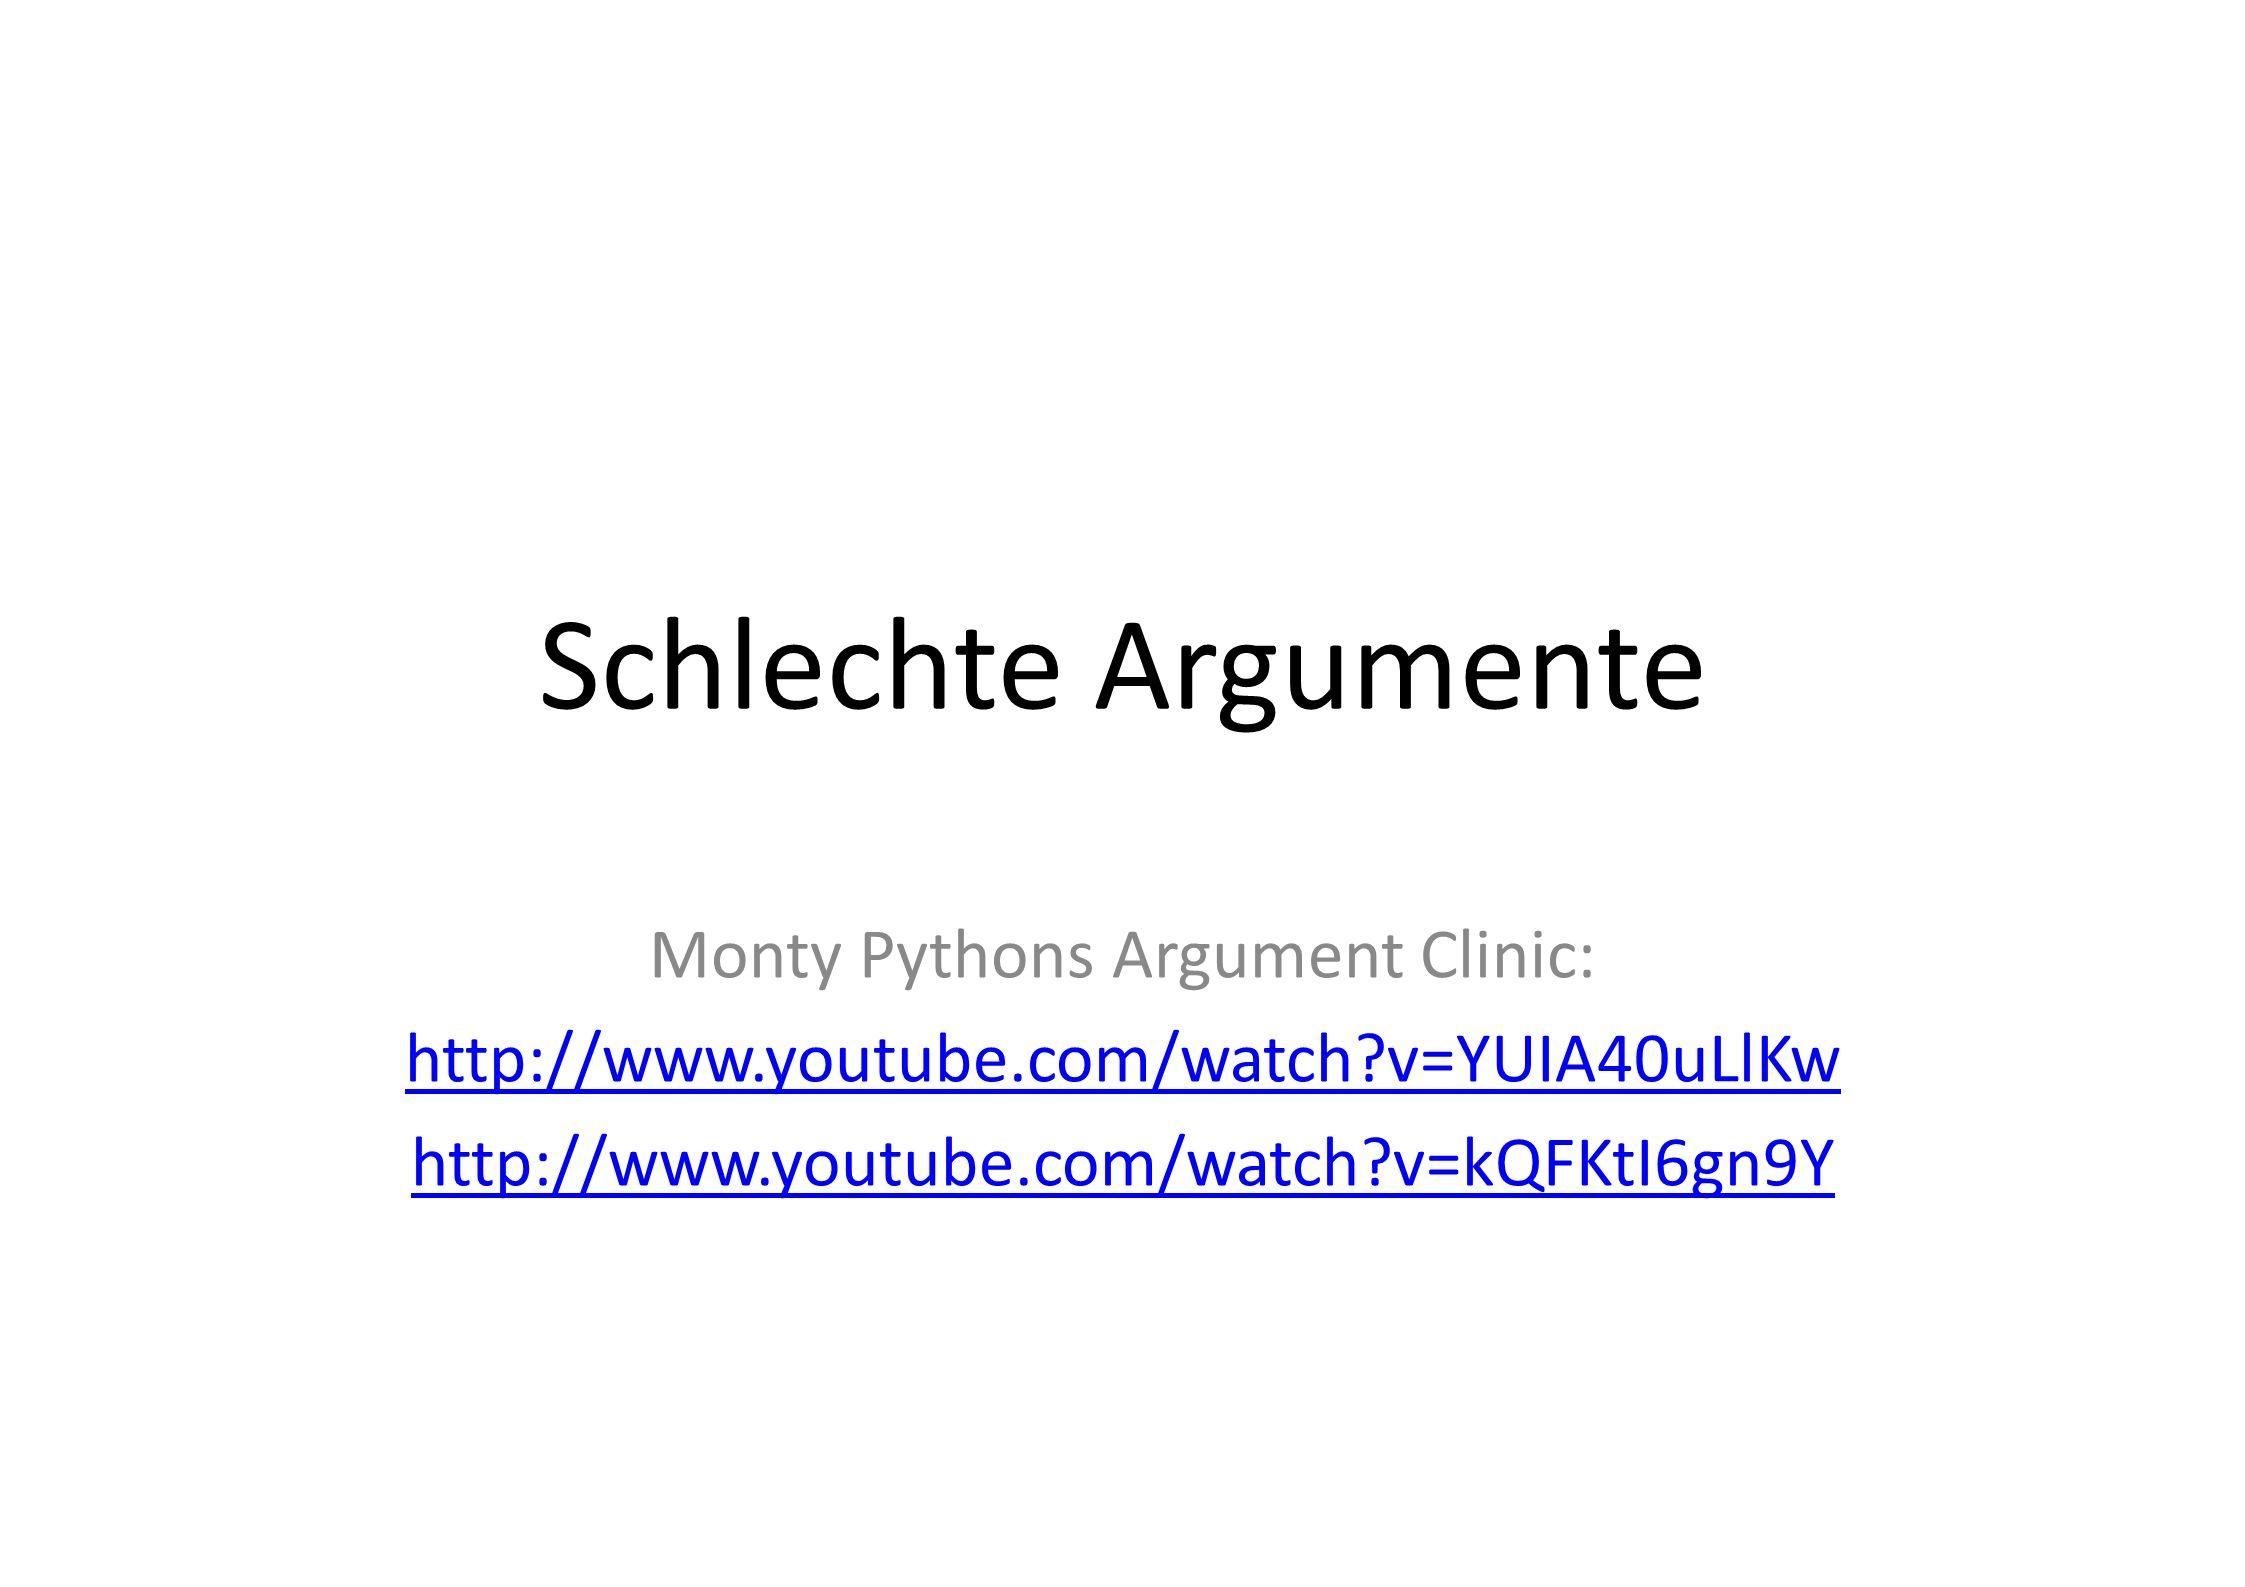 Schlechte Argumente Monty Pythons Argument Clinic: http://www.youtube.com/watch?v=YUIA40uLlKw http://www.youtube.com/watch?v=kQFKtI6gn9Y